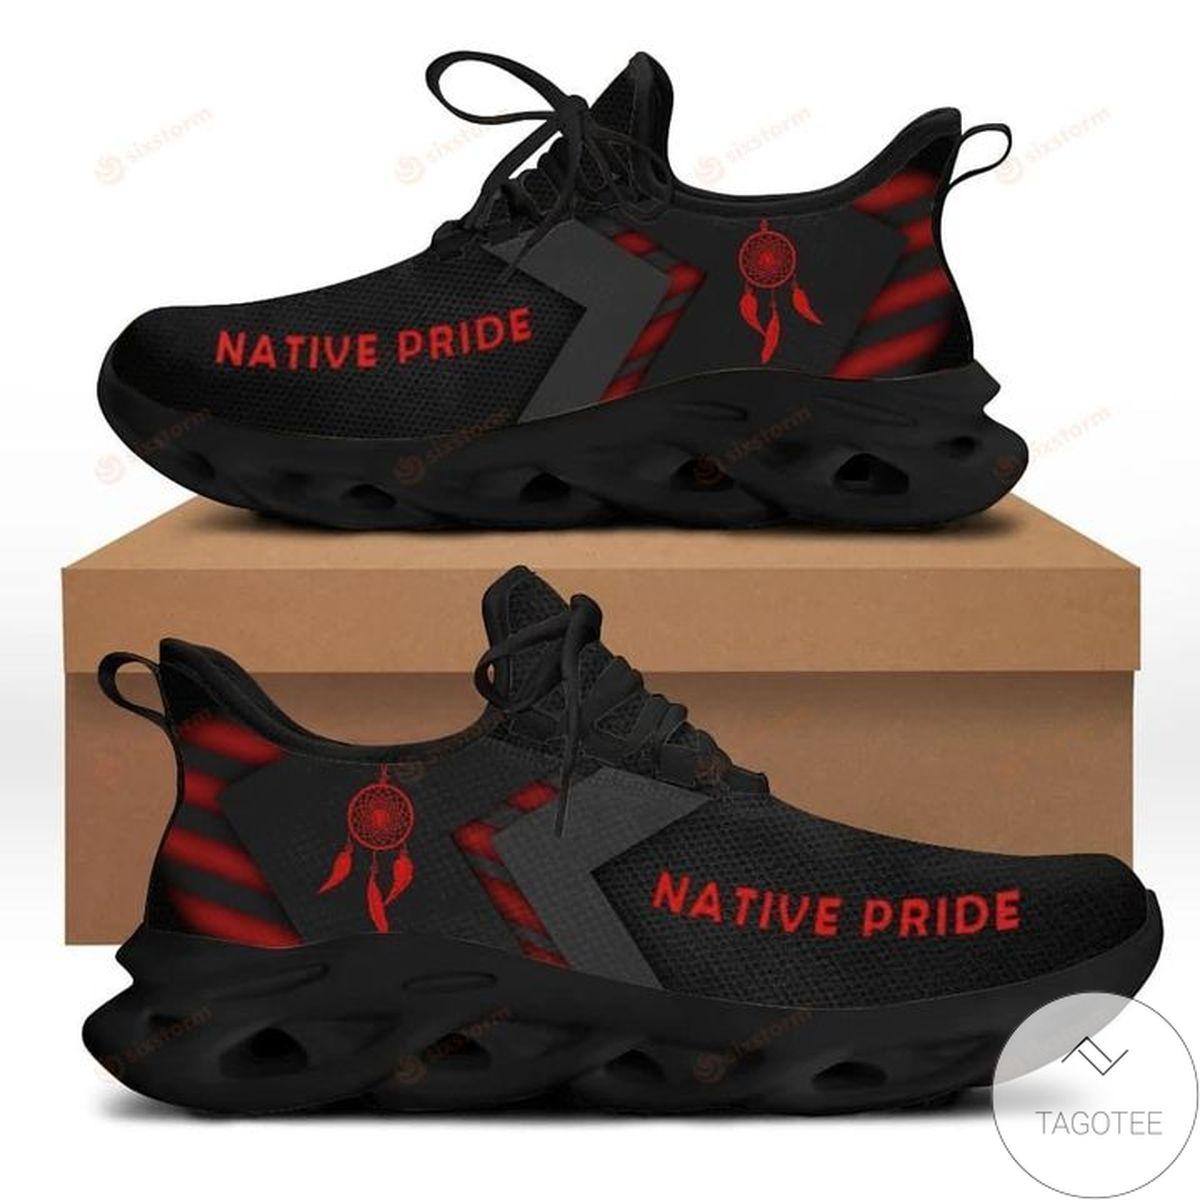 American Native Pride Max Soul Shoes